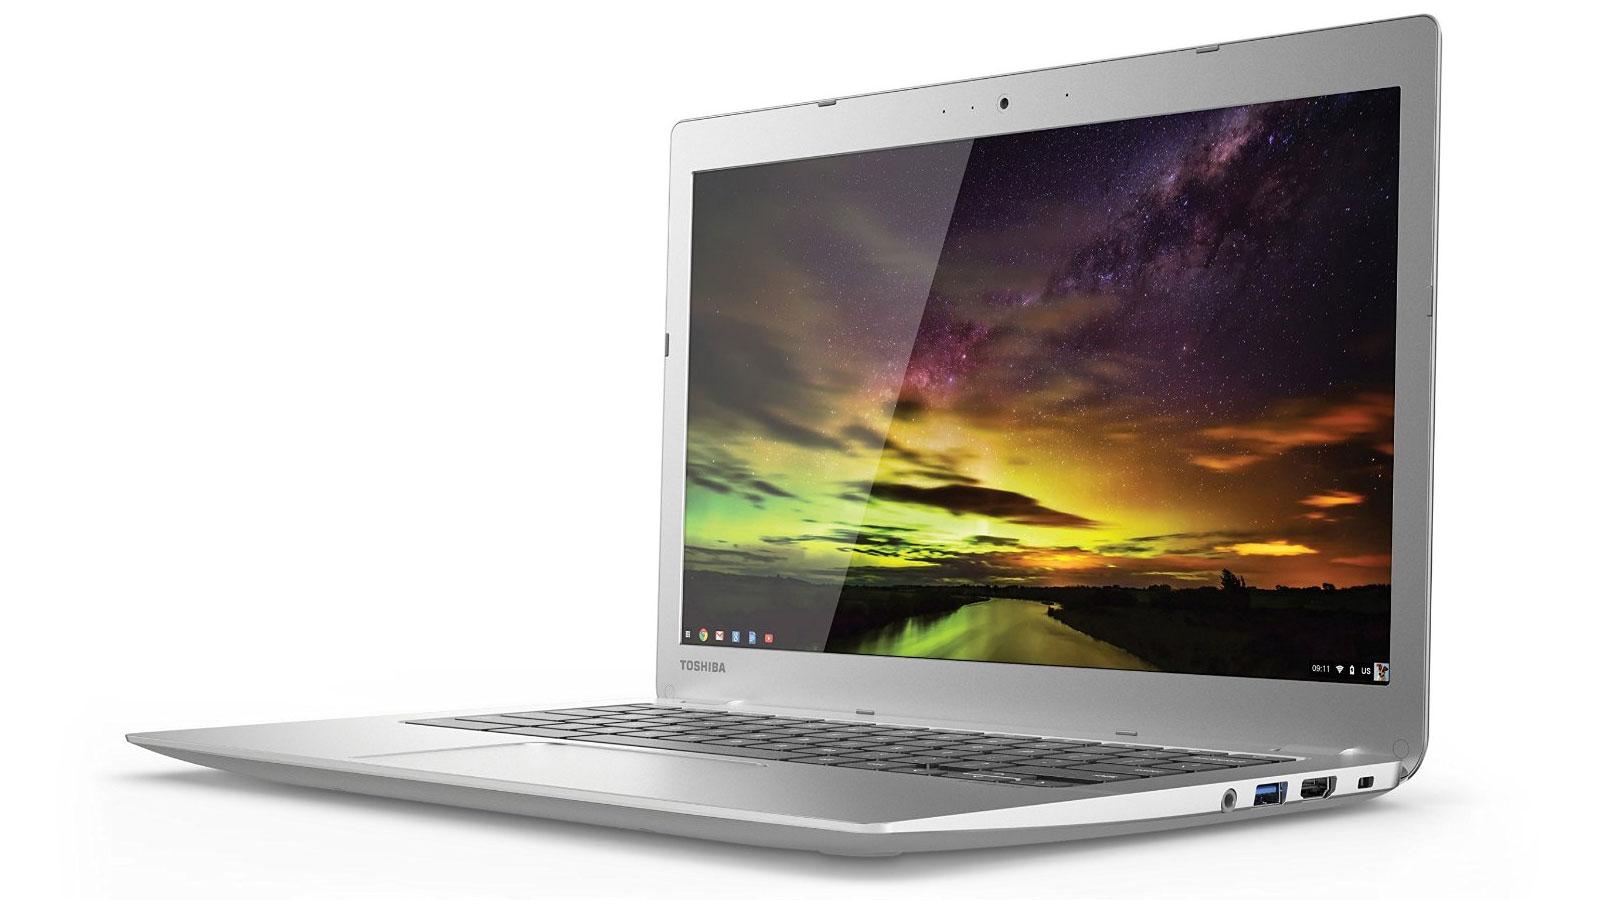 Toshiba -Chromebook 2